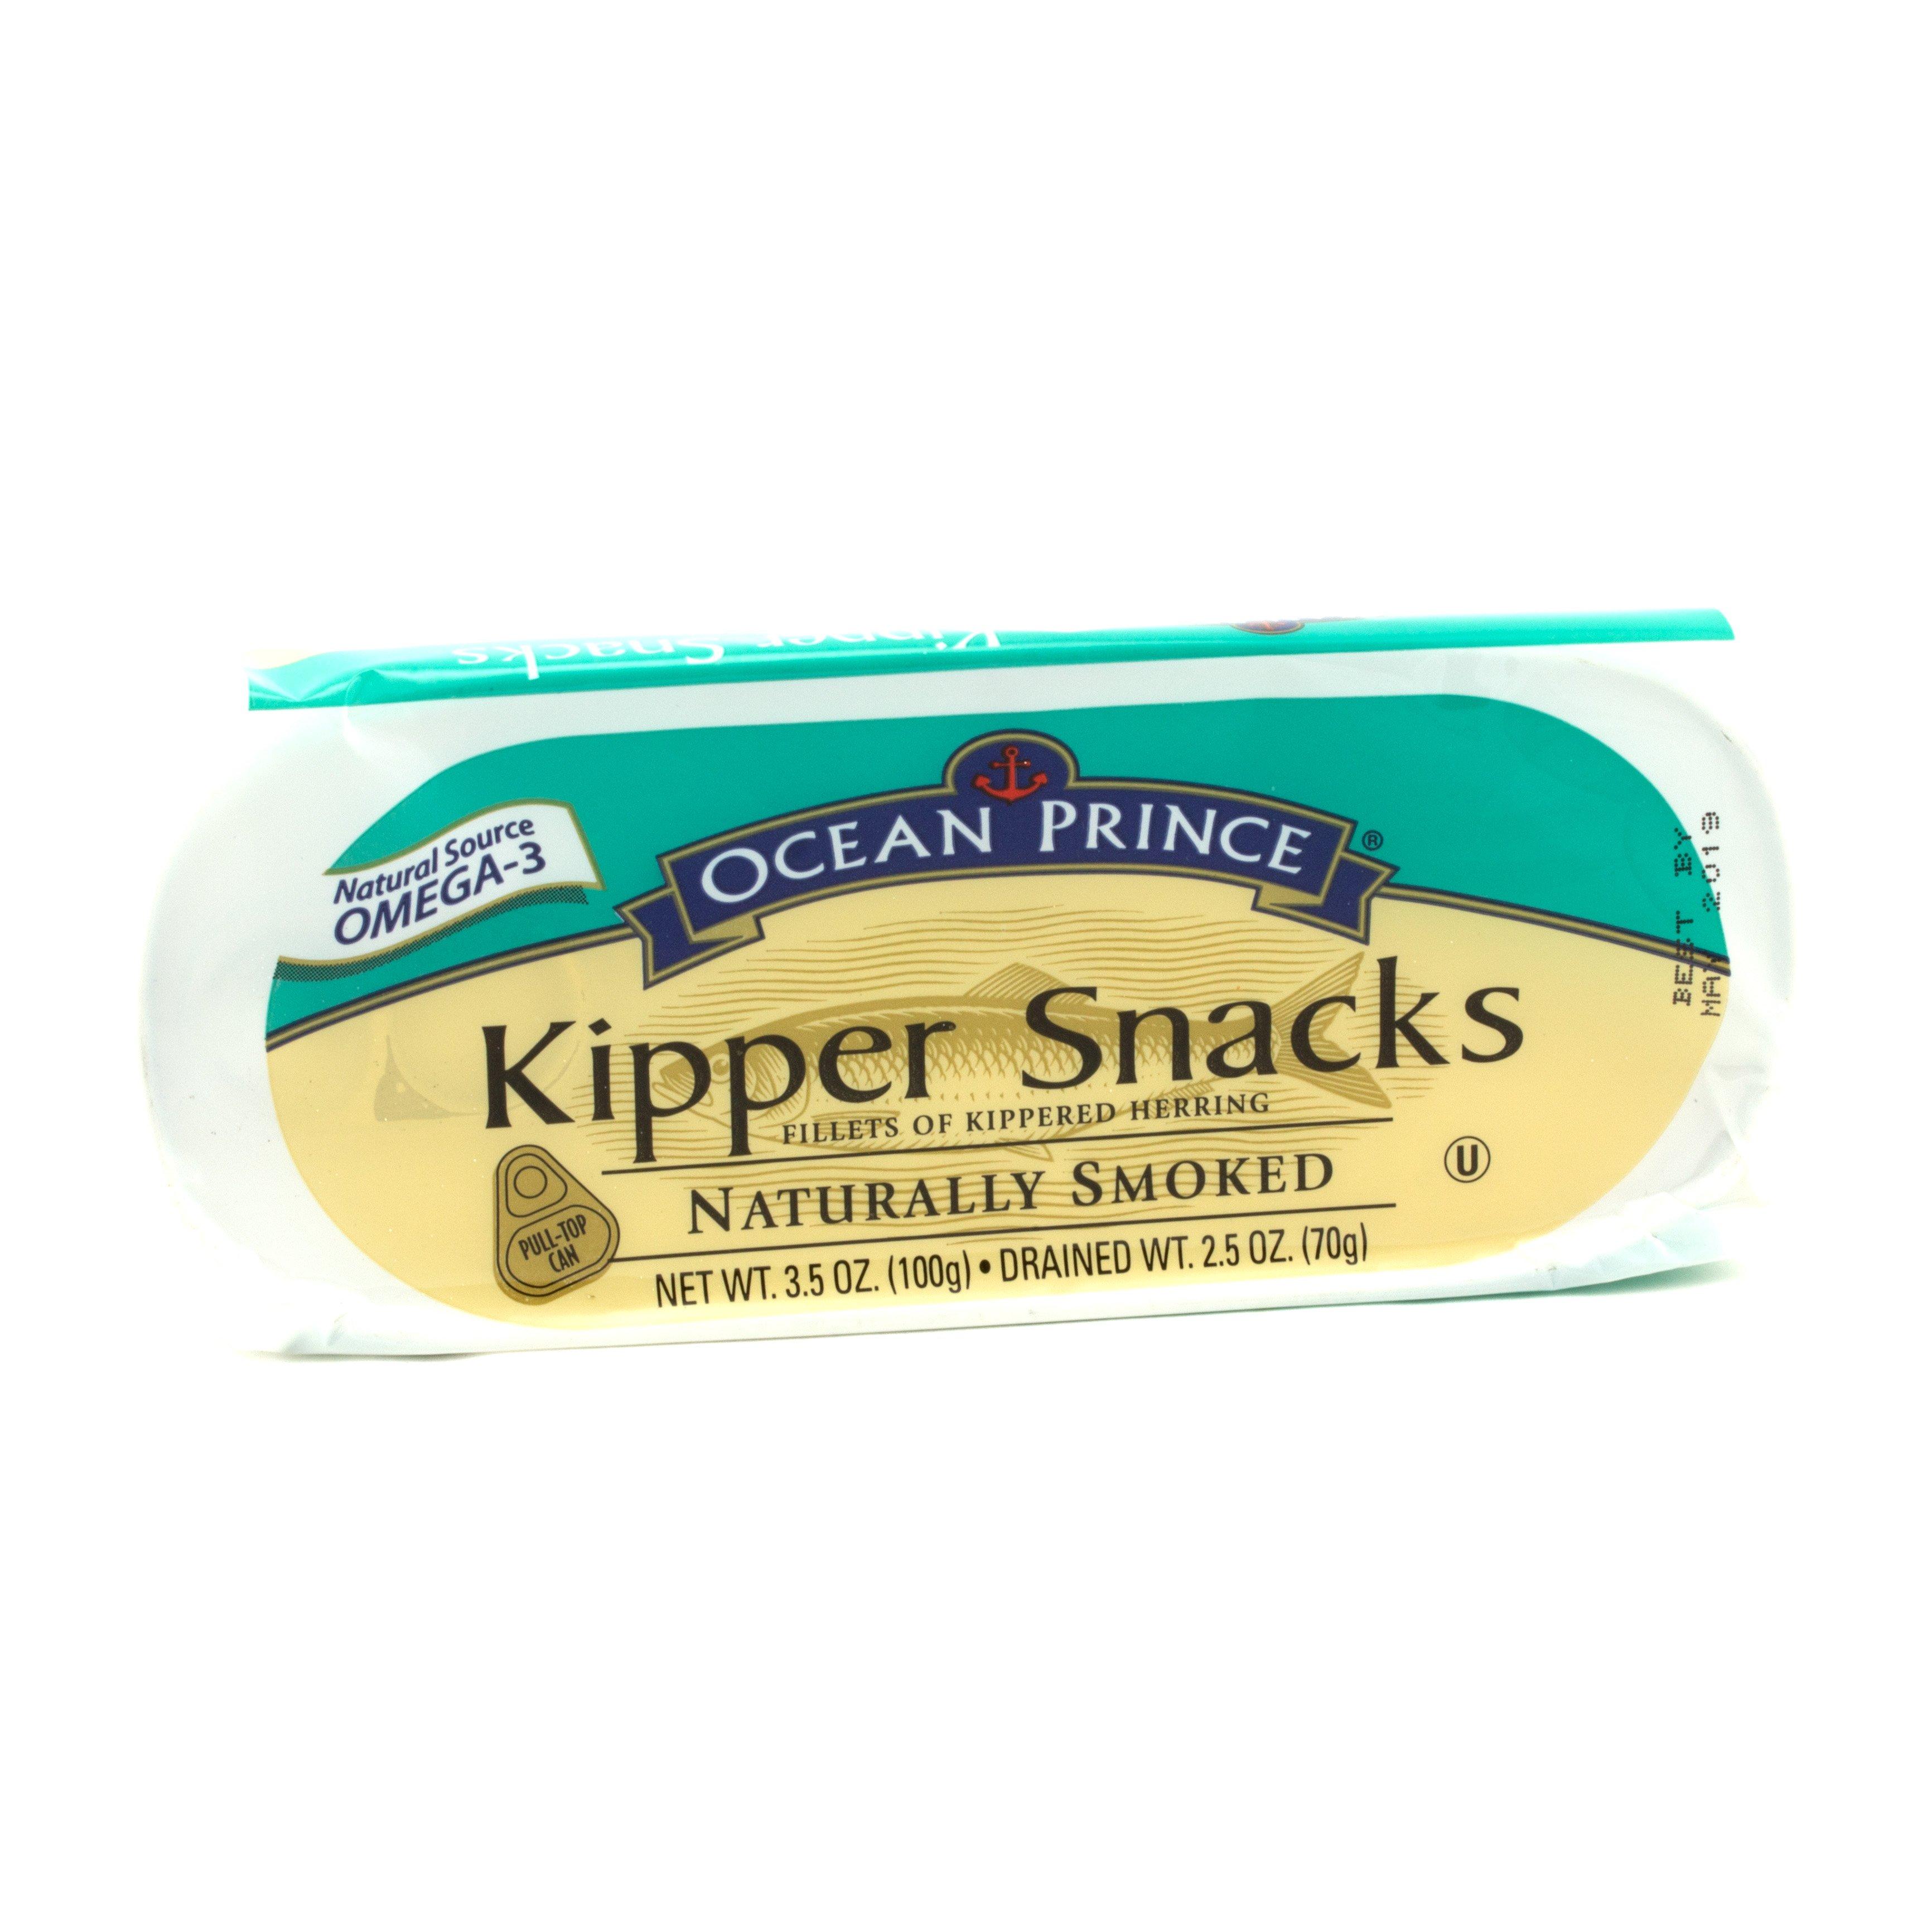 Ocean Prince Kipper Snacks - Shop